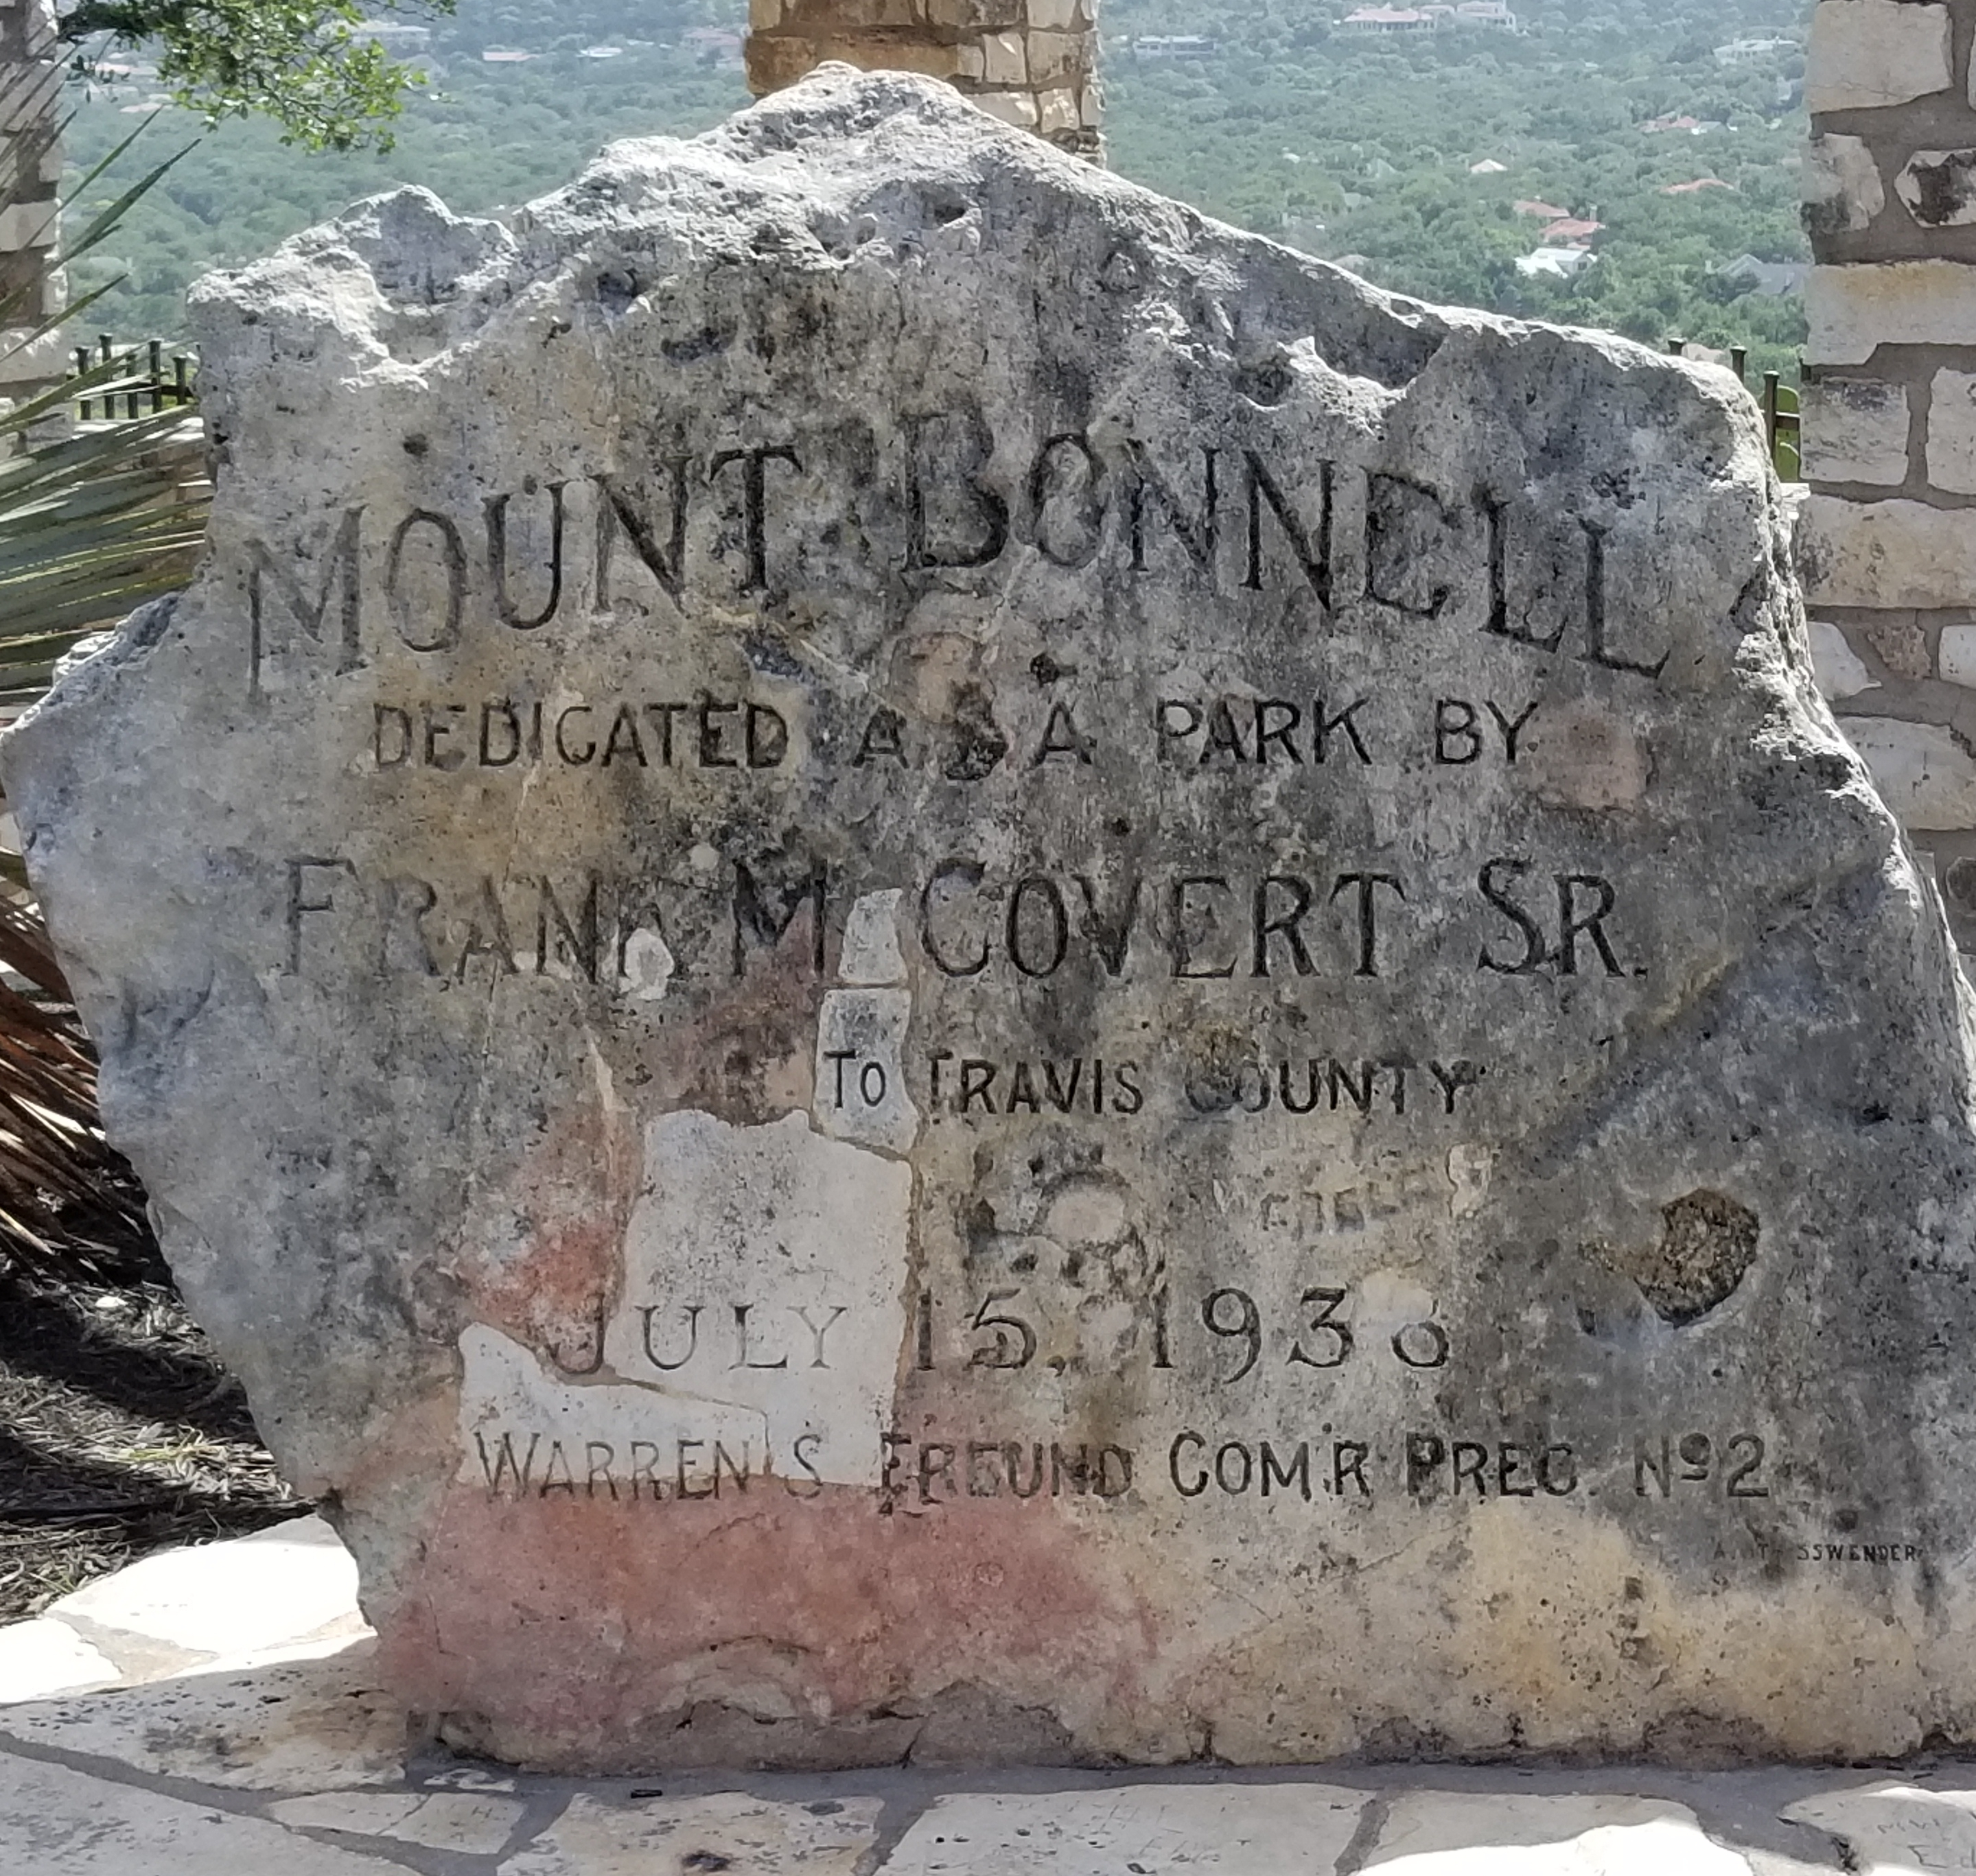 Mount-Bonnell-rock-sign